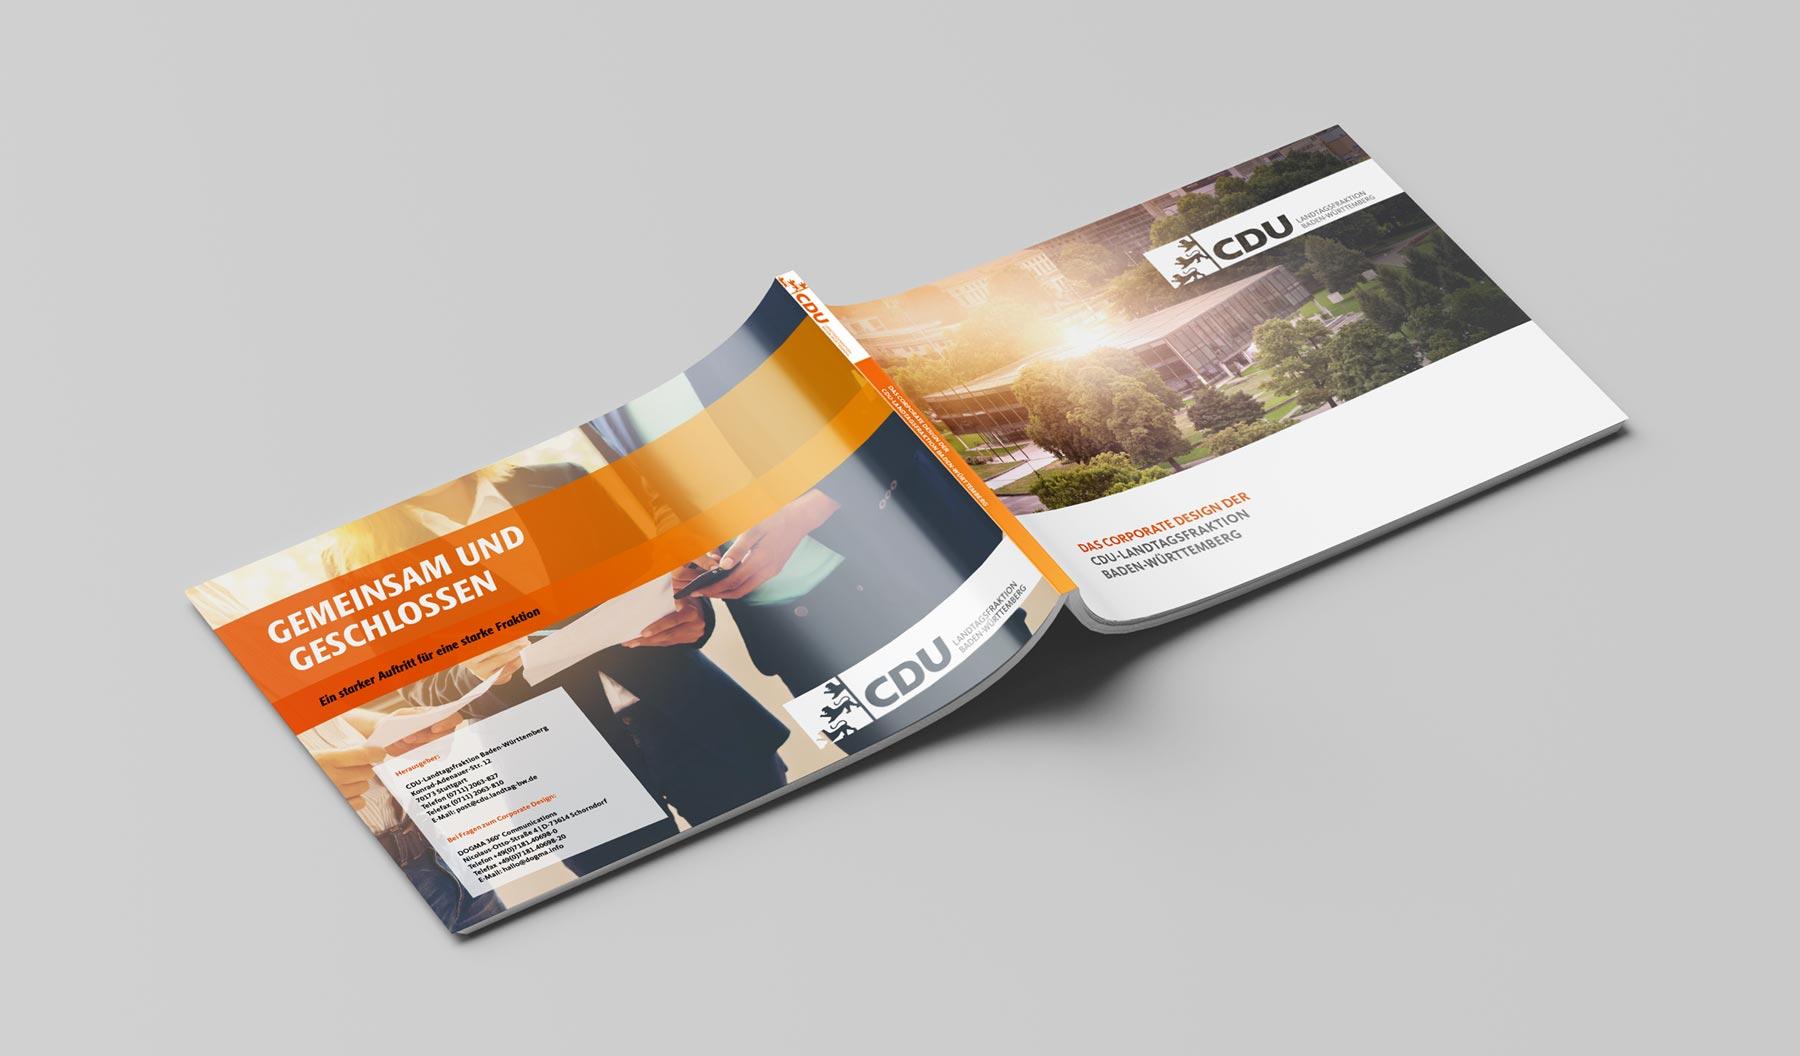 CDU_LF_BW, Styleguide, Corporate Design Relaunch, Redesign, Aussenansicht